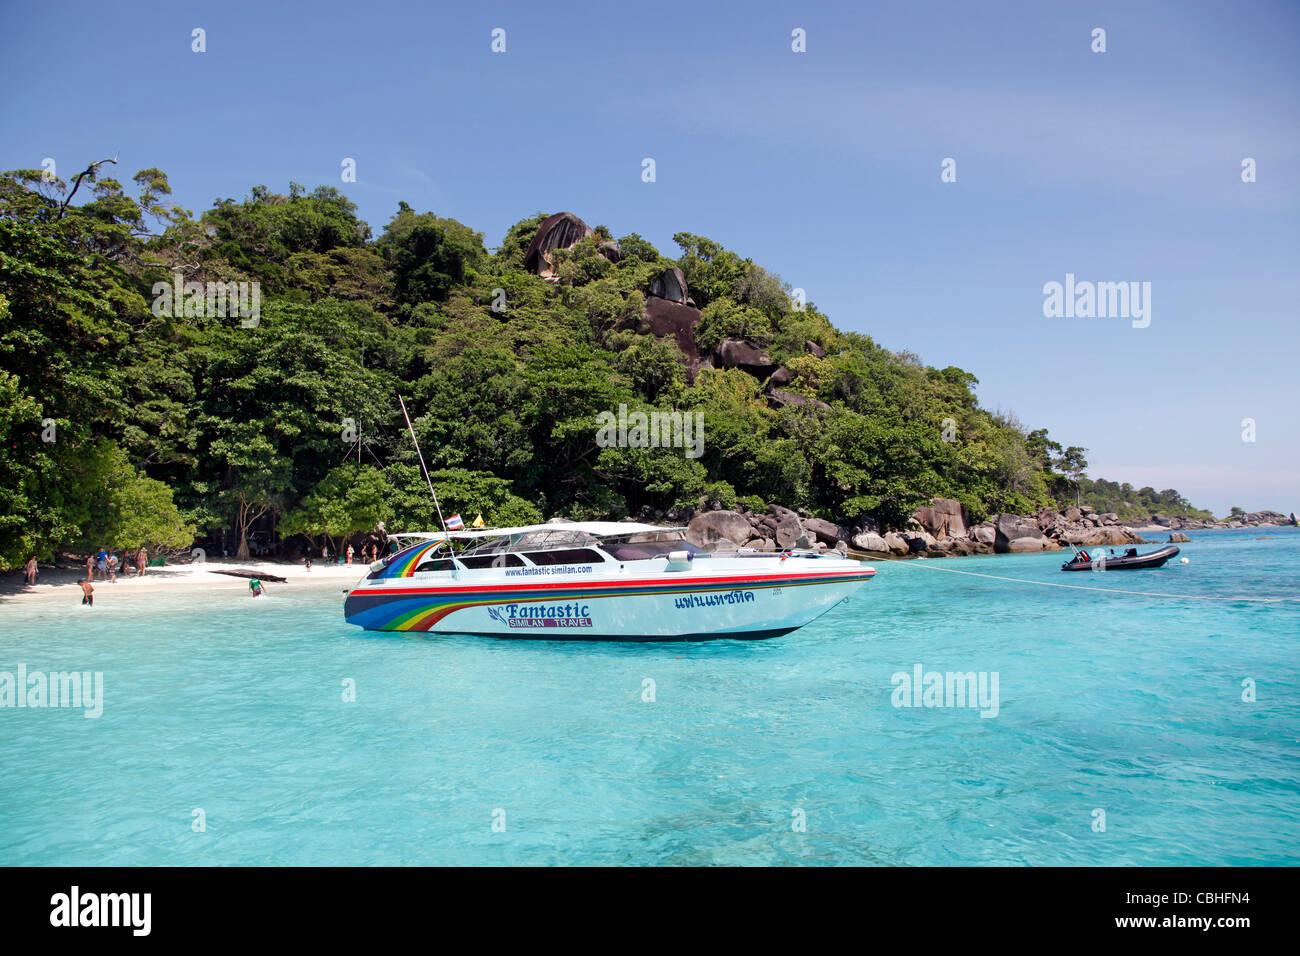 Speedboat at Miang Island, Similan Islands, Phang-Nga, near Phuket, Thailand - Stock Image